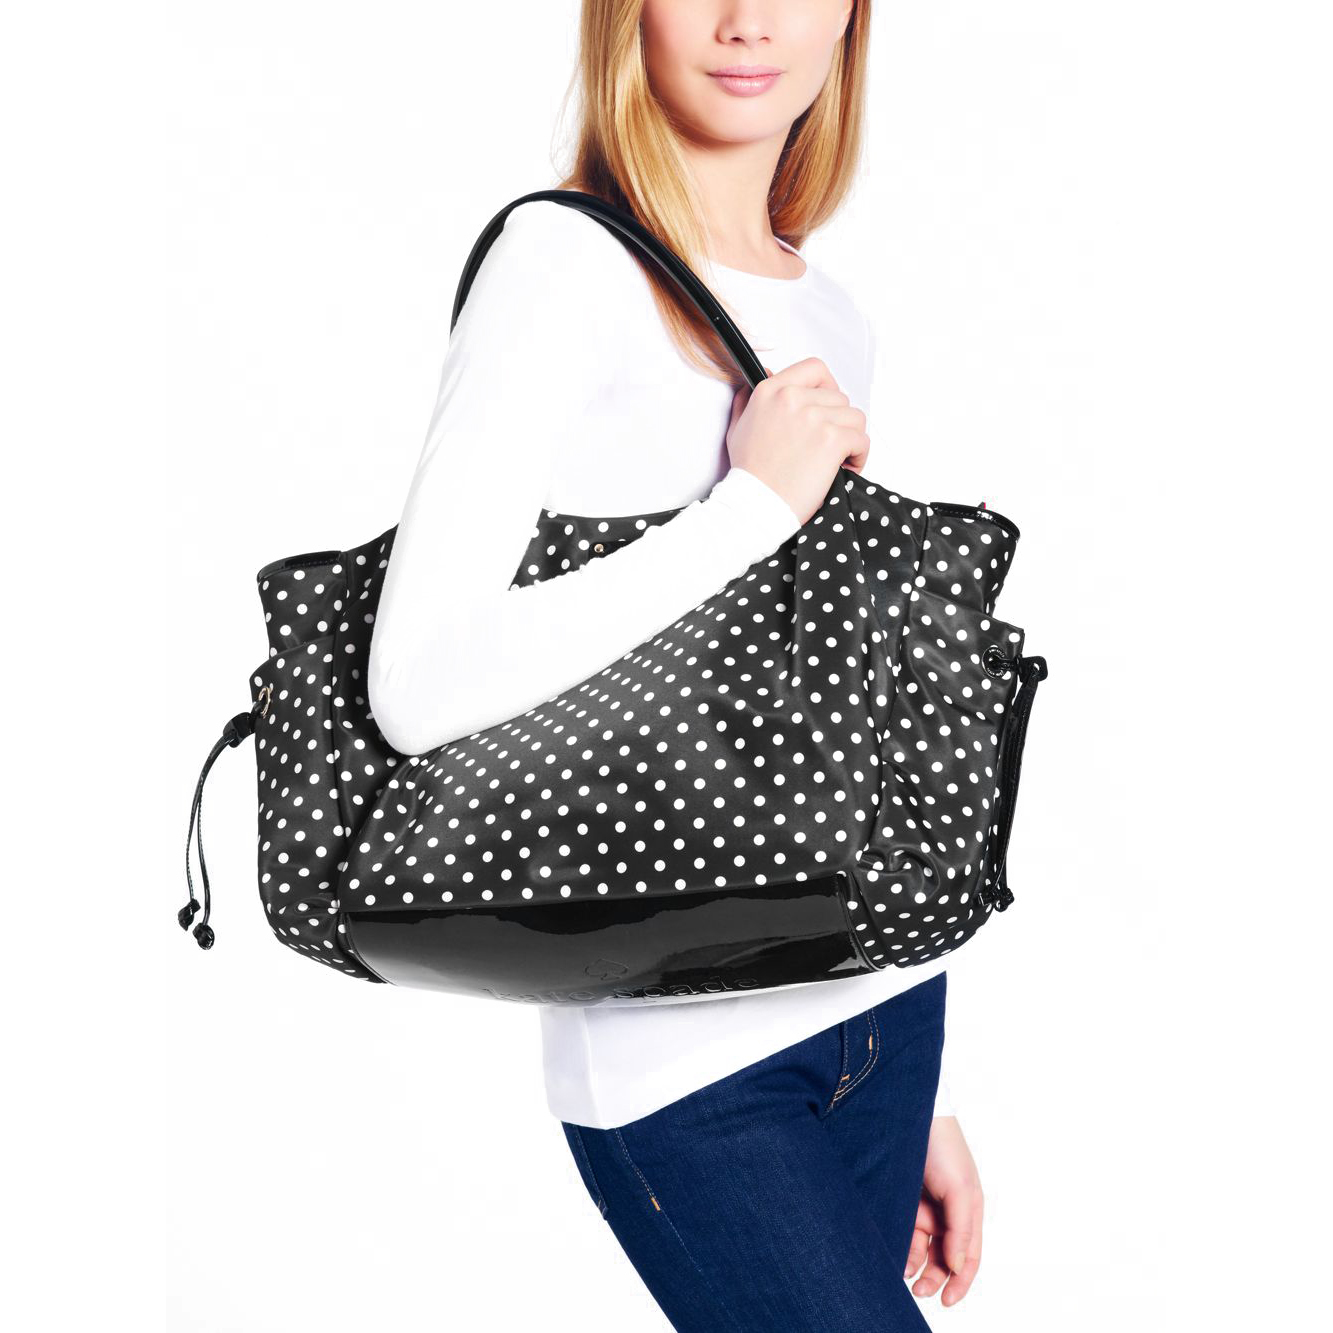 Kate Spade Spot Nylon Stevie Baby Bag Black Cream Polka Dot Wkru1613